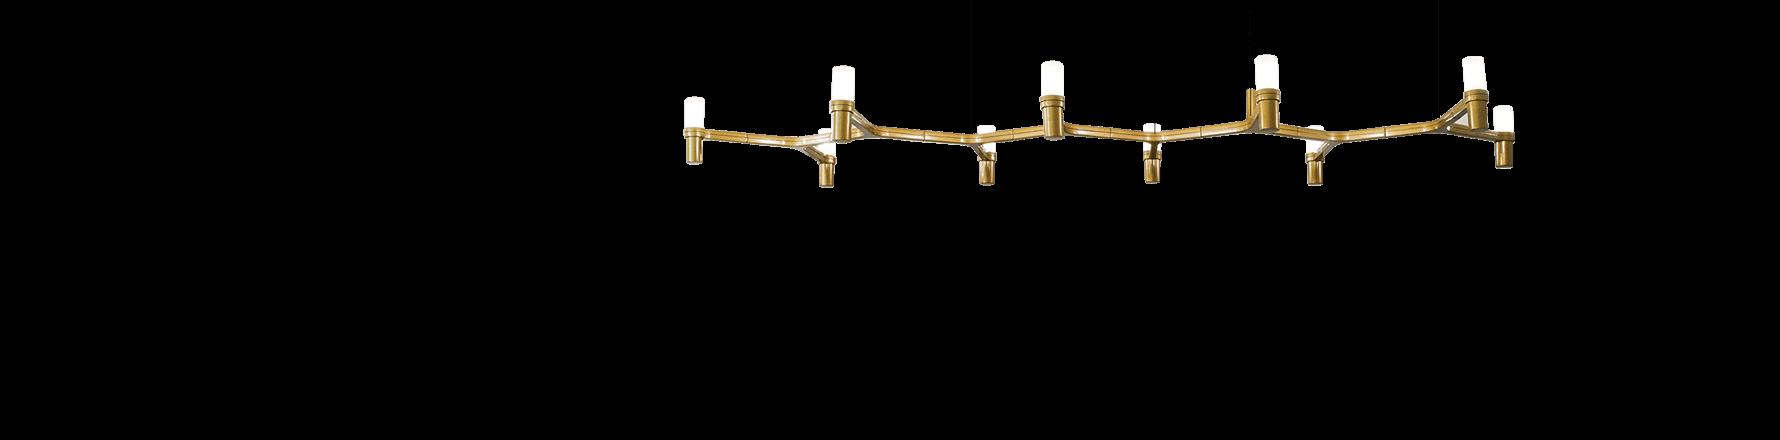 Lampes à Suspension en Or